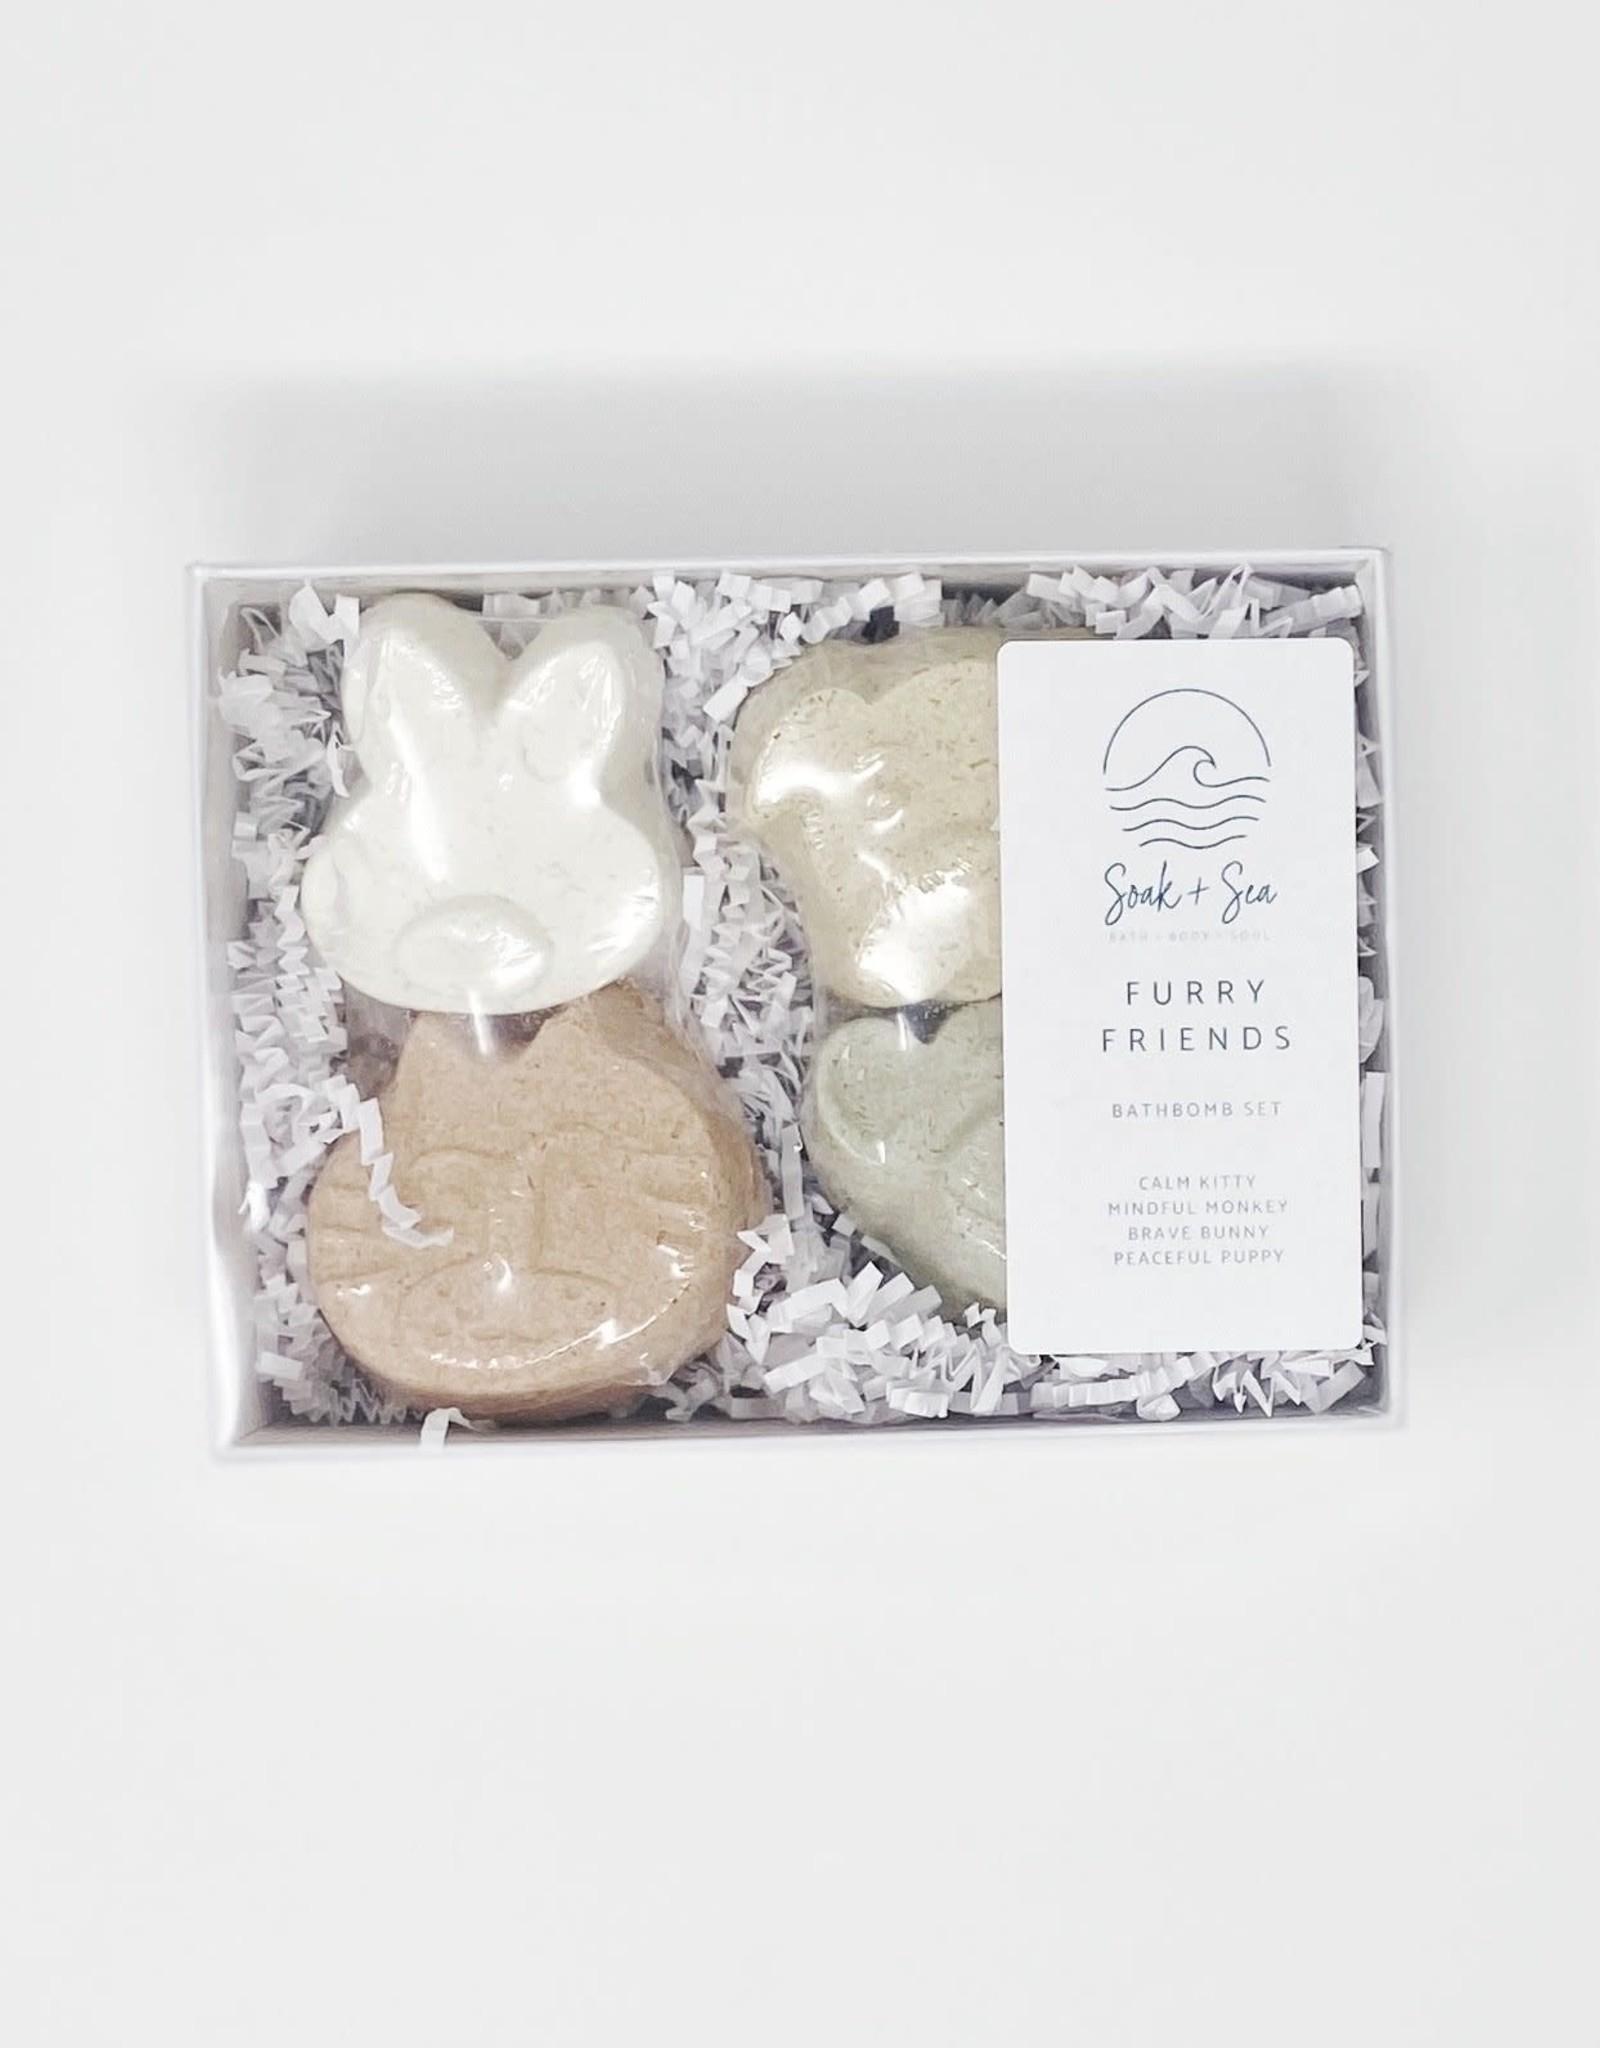 Soak and Sea Soak & Sea Furry Friends, Bathbomb set